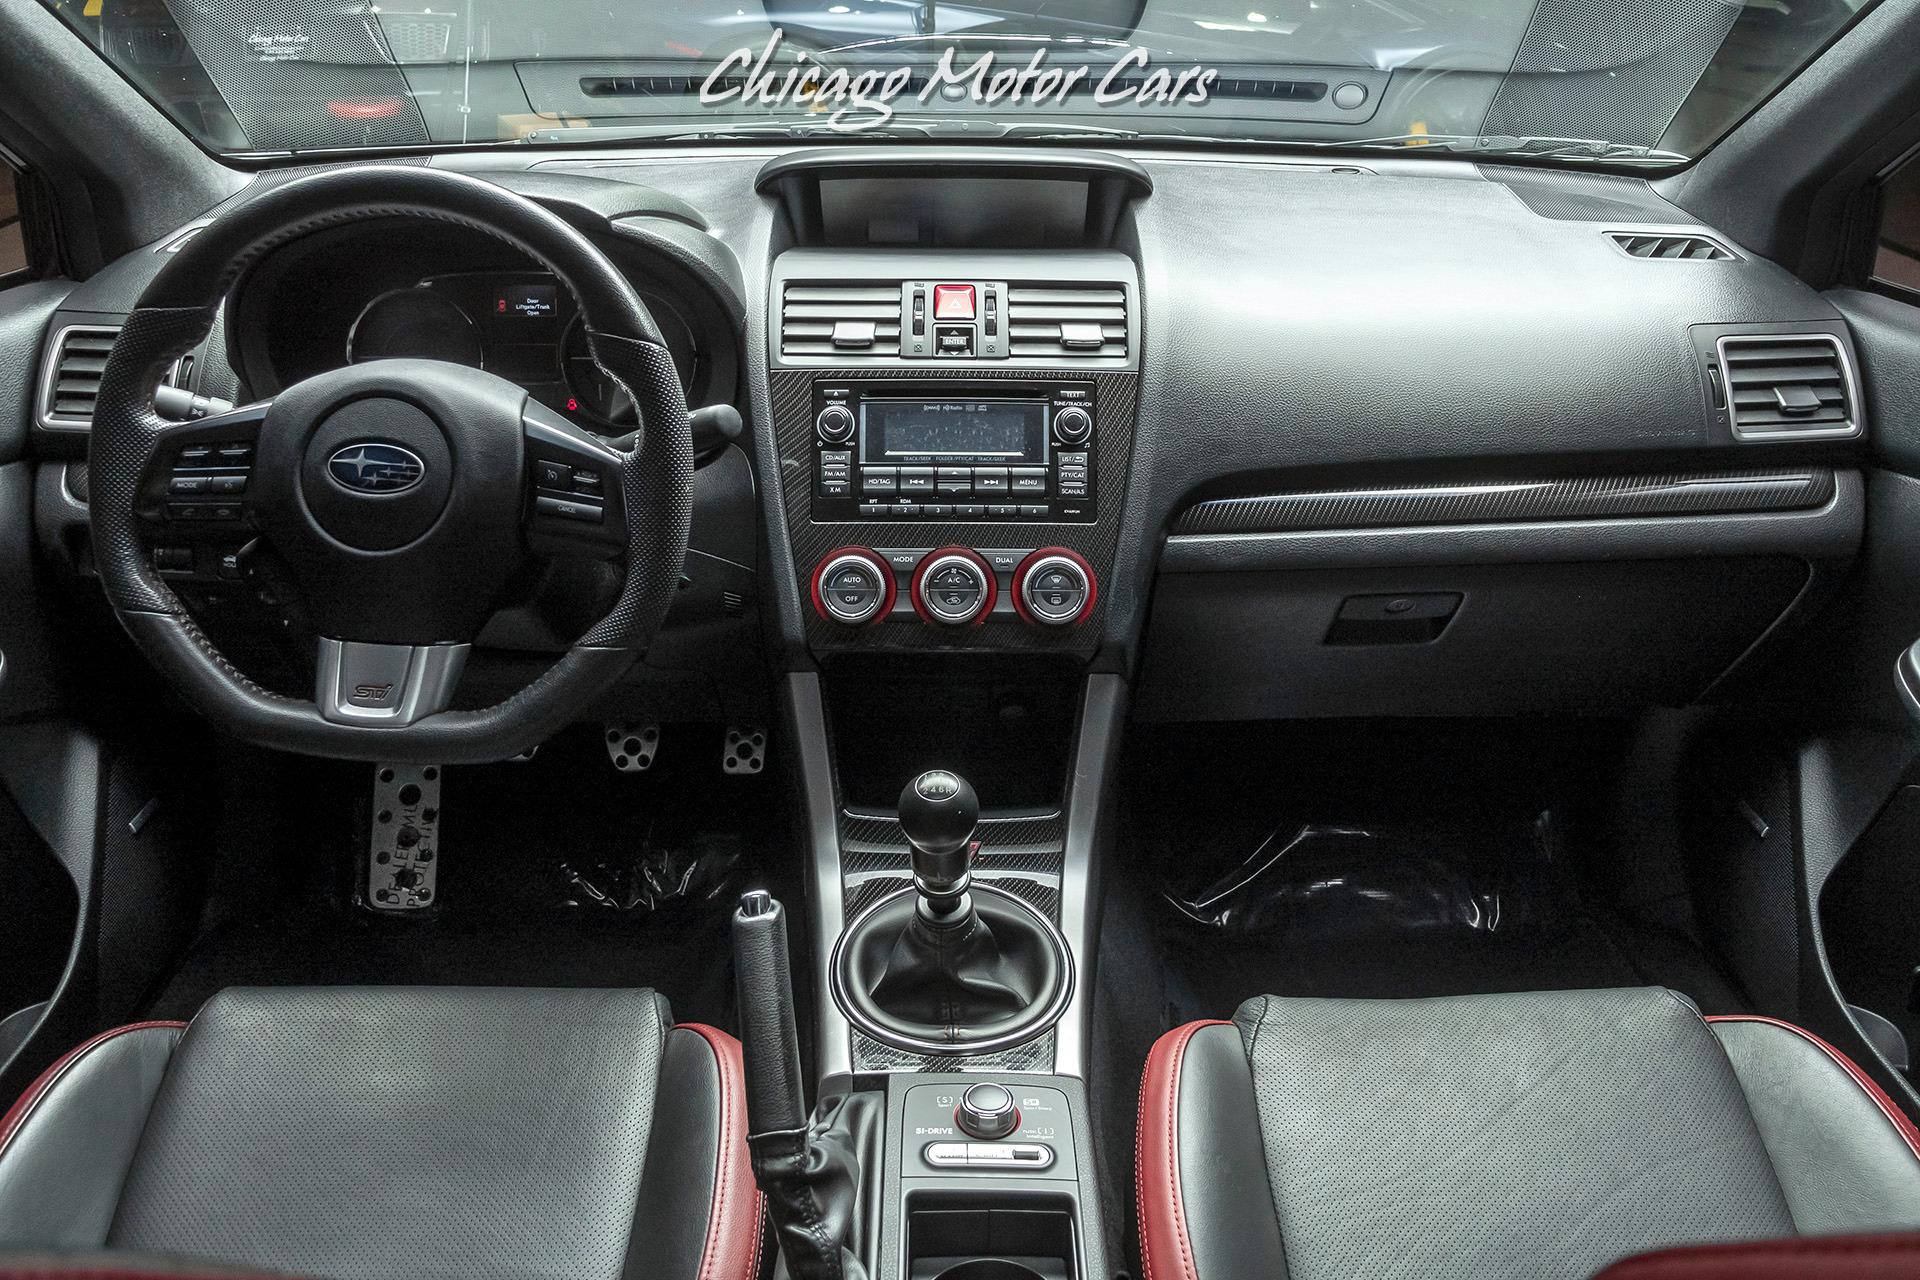 Used-2015-Subaru-WRX-STI-Limited-Sedan-ONLY-32K-Miles--FUN-6-SPEED-MANUAL